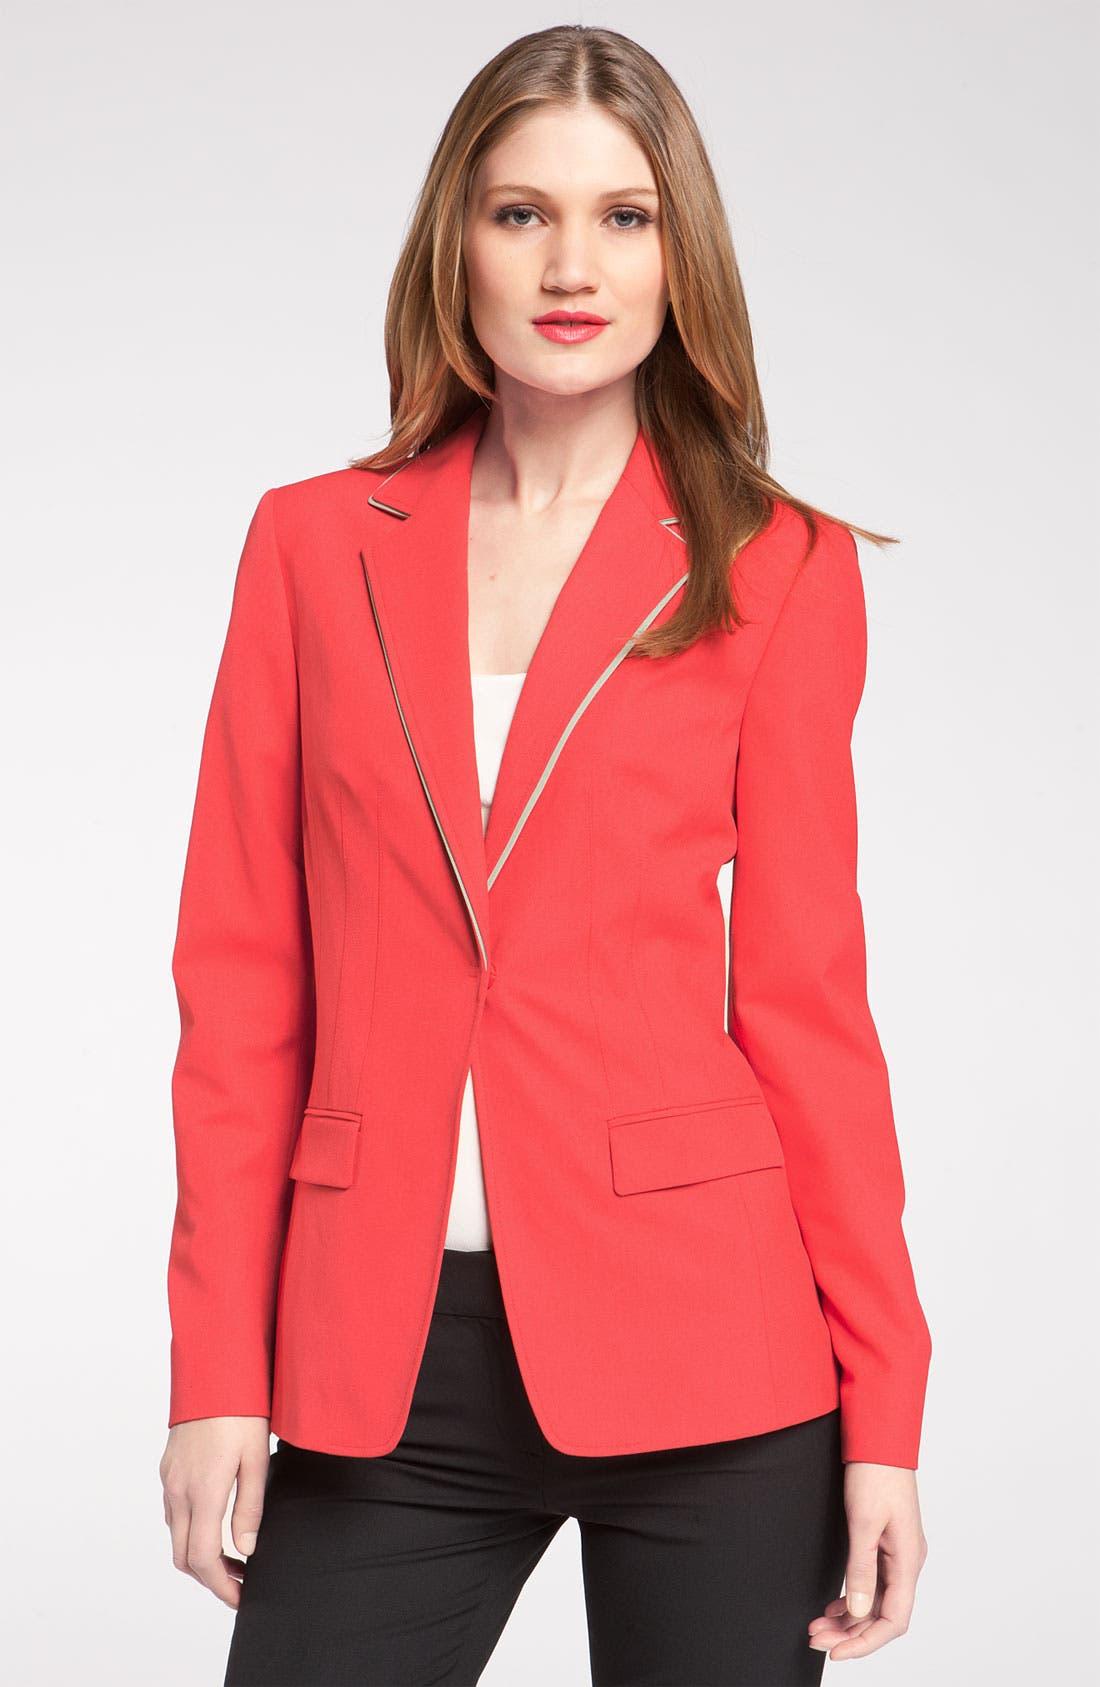 Alternate Image 1 Selected - Elie Tahari Exclusive for Nordstrom 'Melissa' Contrast Trim Jacket (Nordstrom Exclusive)